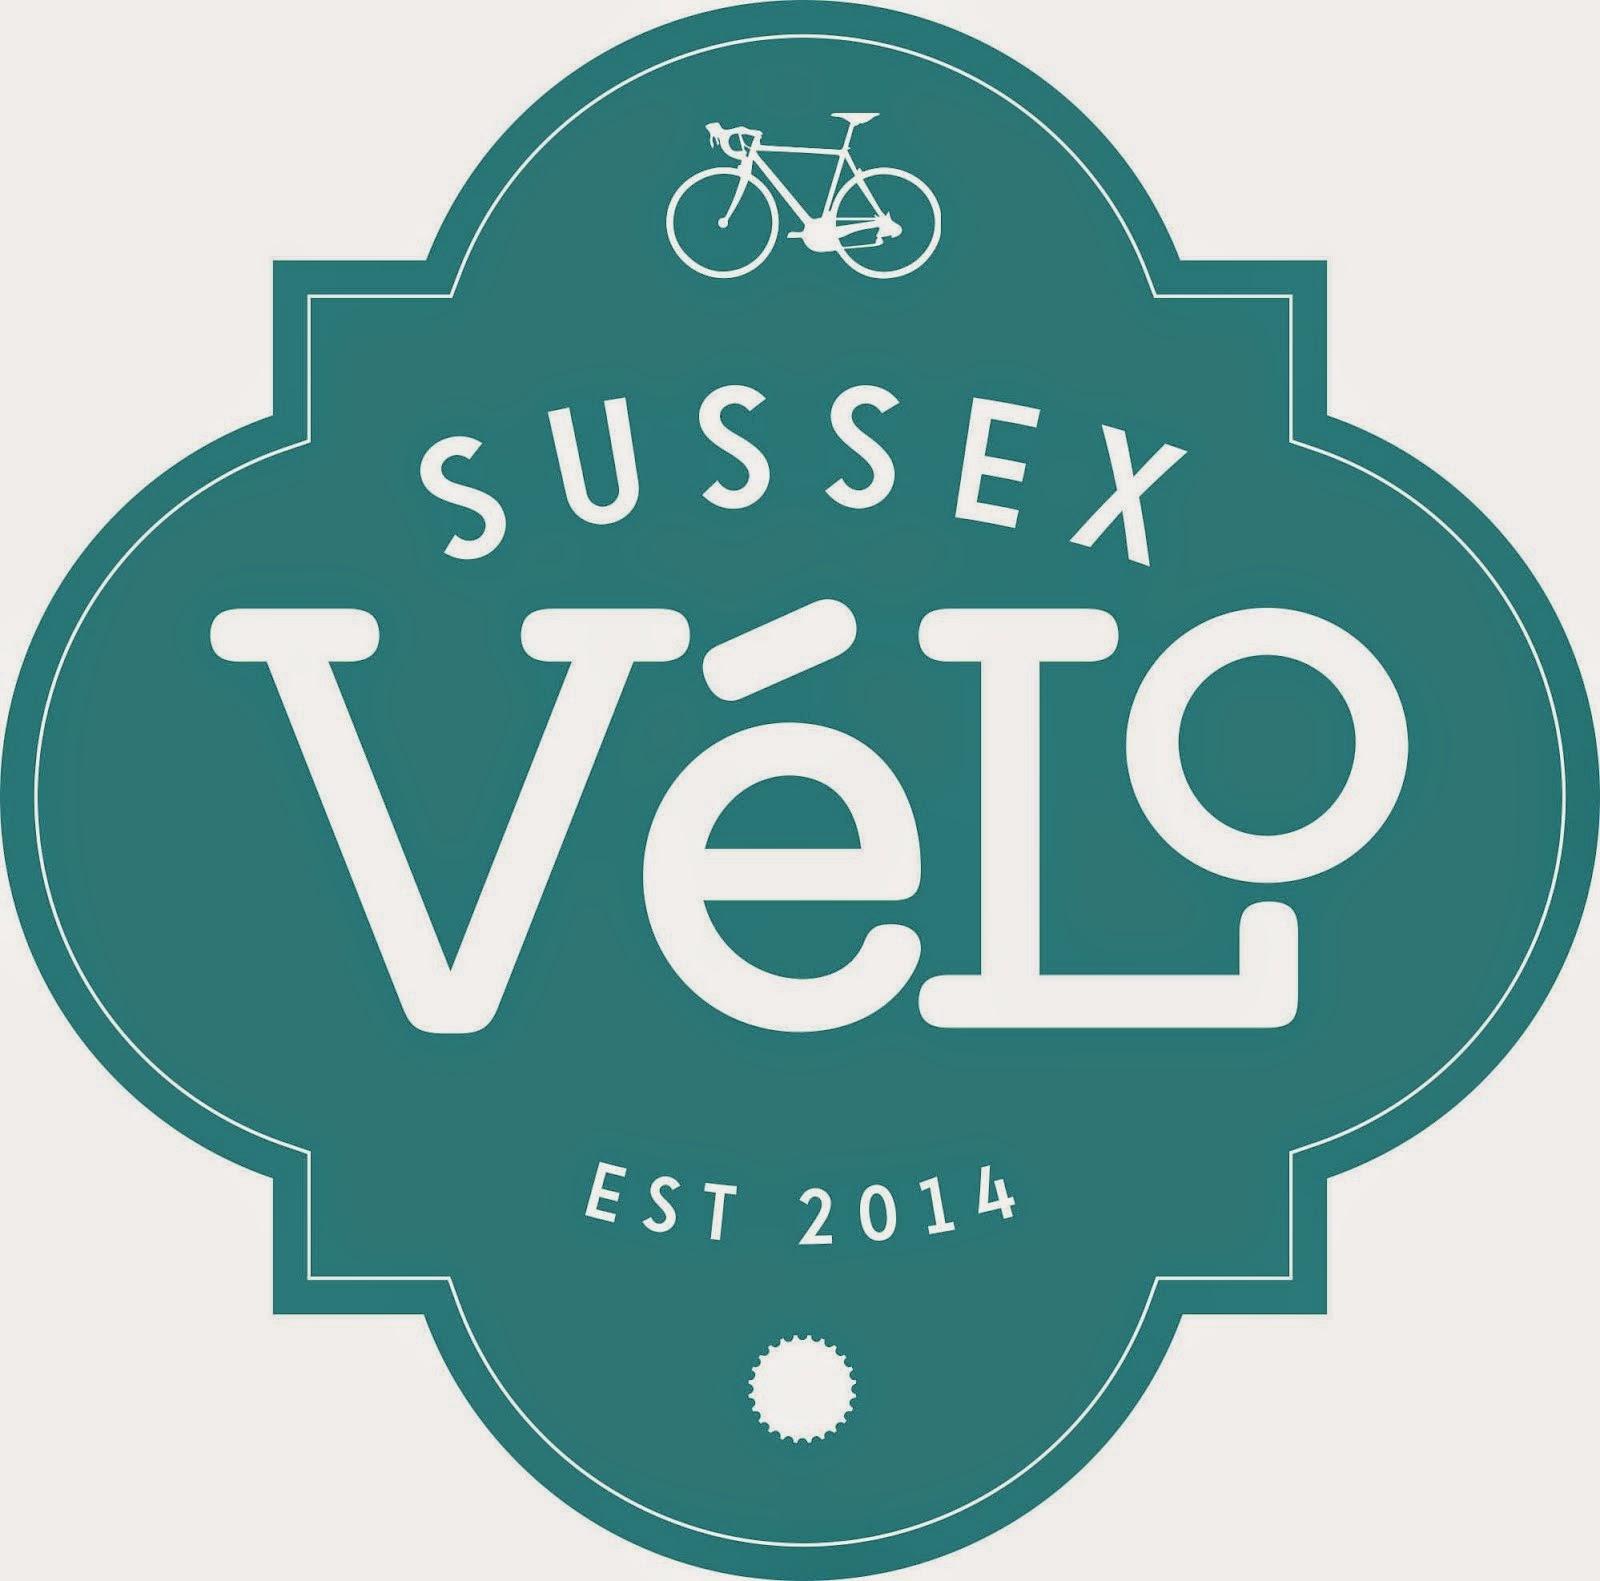 Sussex Velo